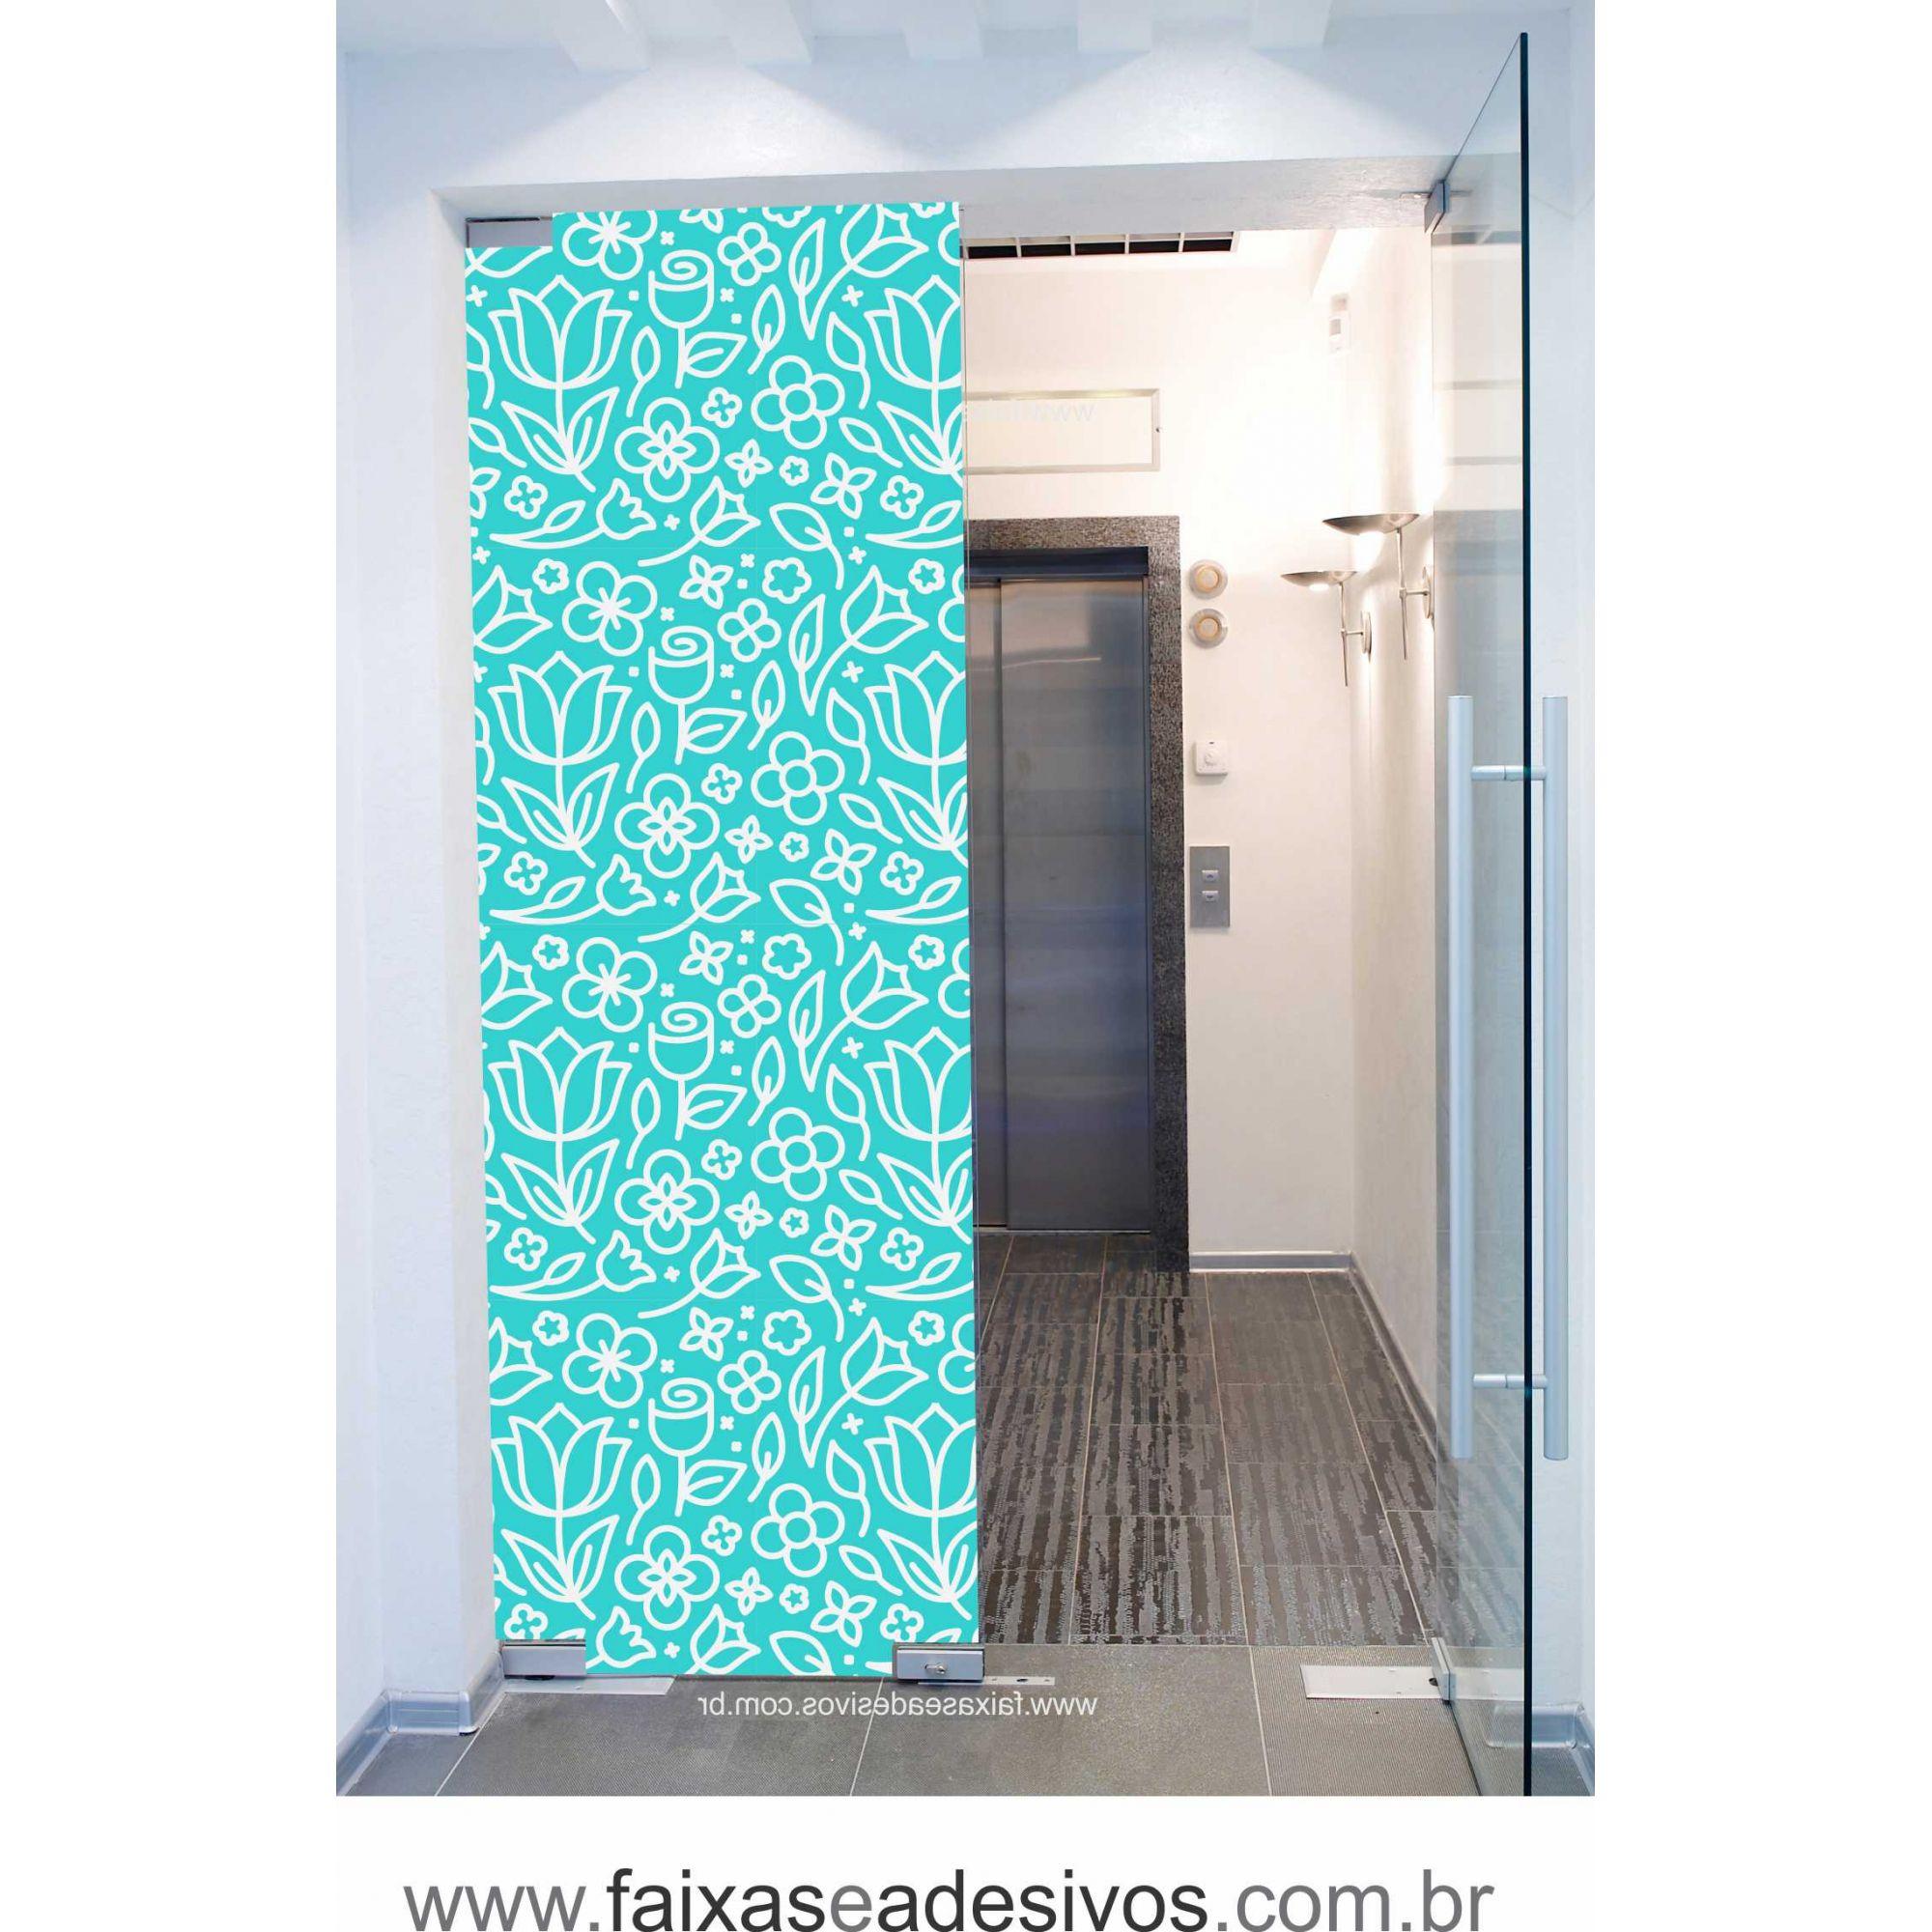 059 VD - Adesivo Jateado para vidro Flores Cartoons  220x70cm  - Fac Signs